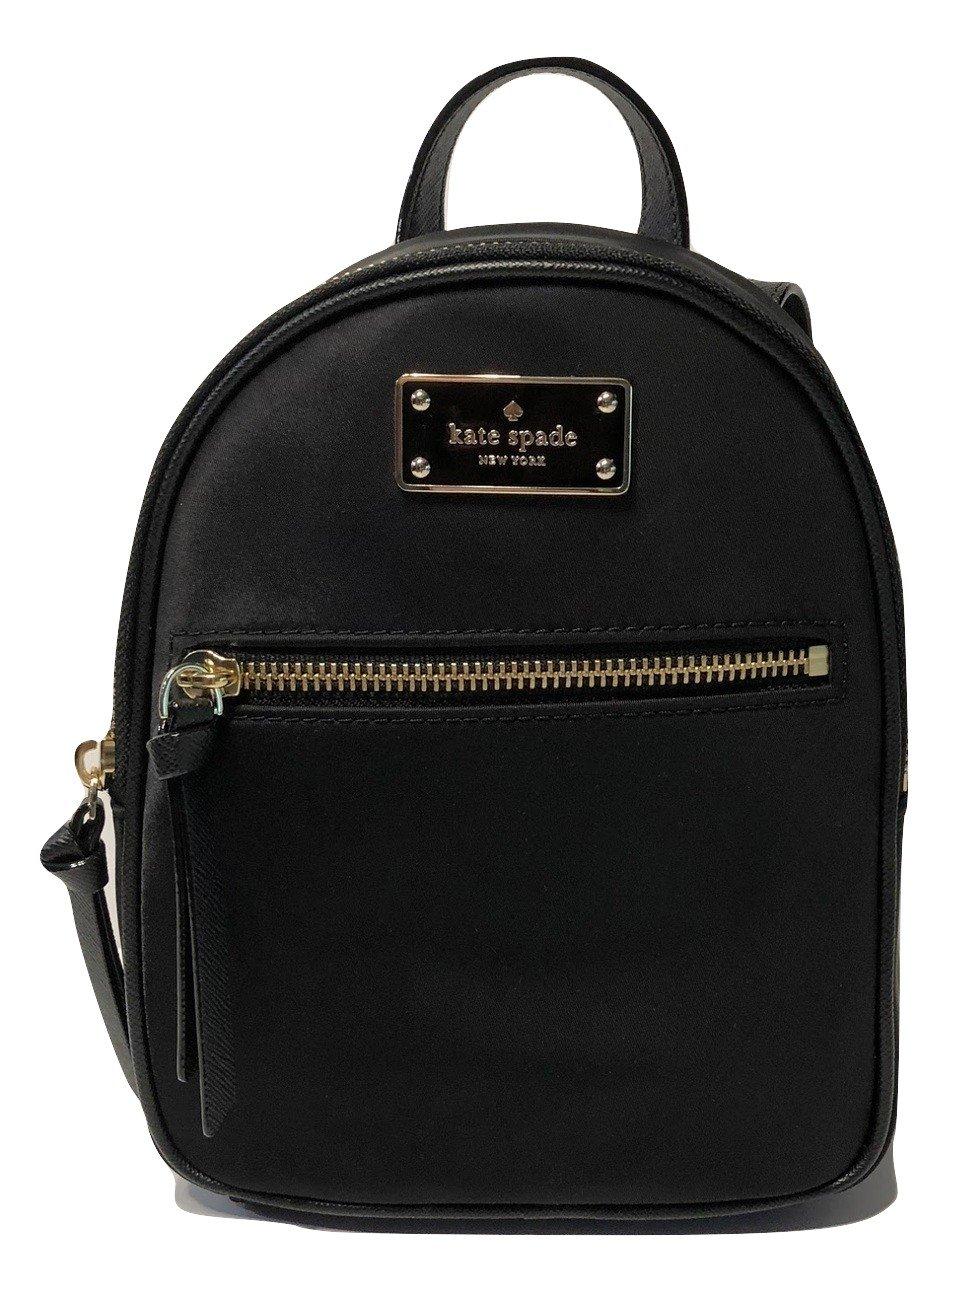 Kate Spade New York Wilson Road Mini Bradley Backpack Purse WKRU3318 Black